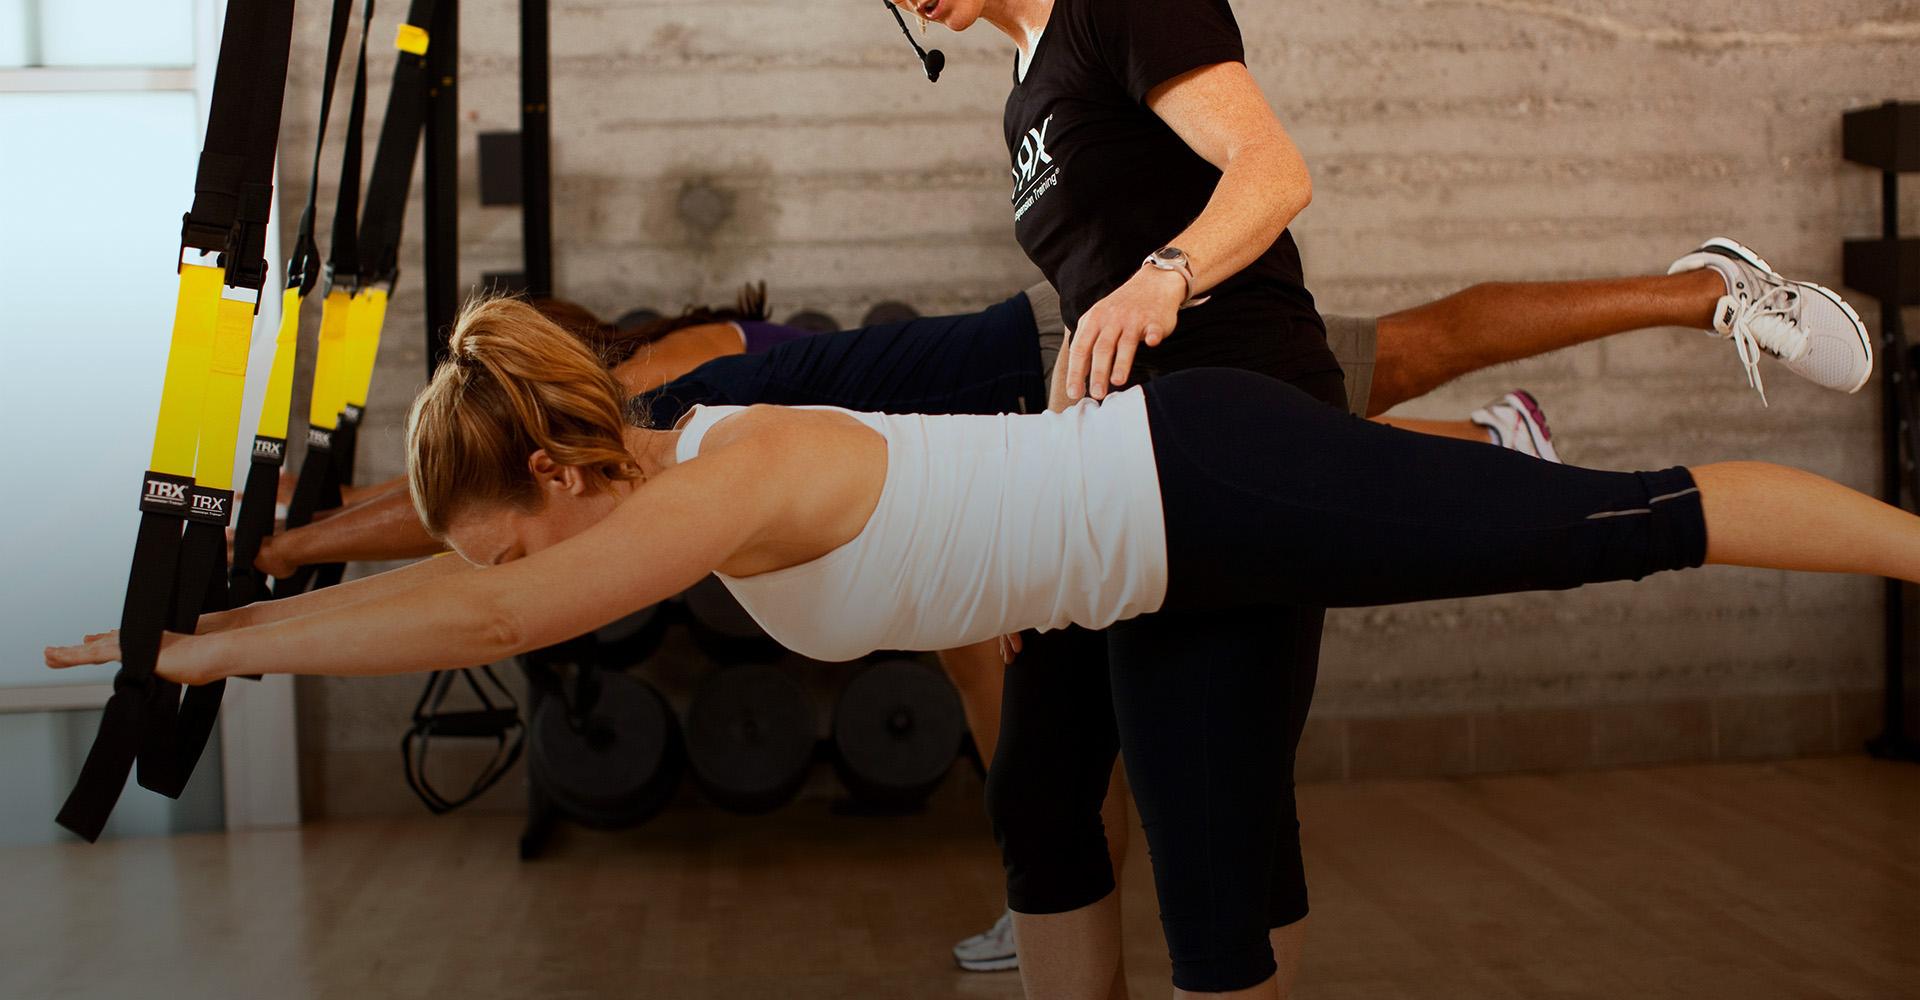 Cours_TRX_Sports_Medecine_Suspension_Training_Courses